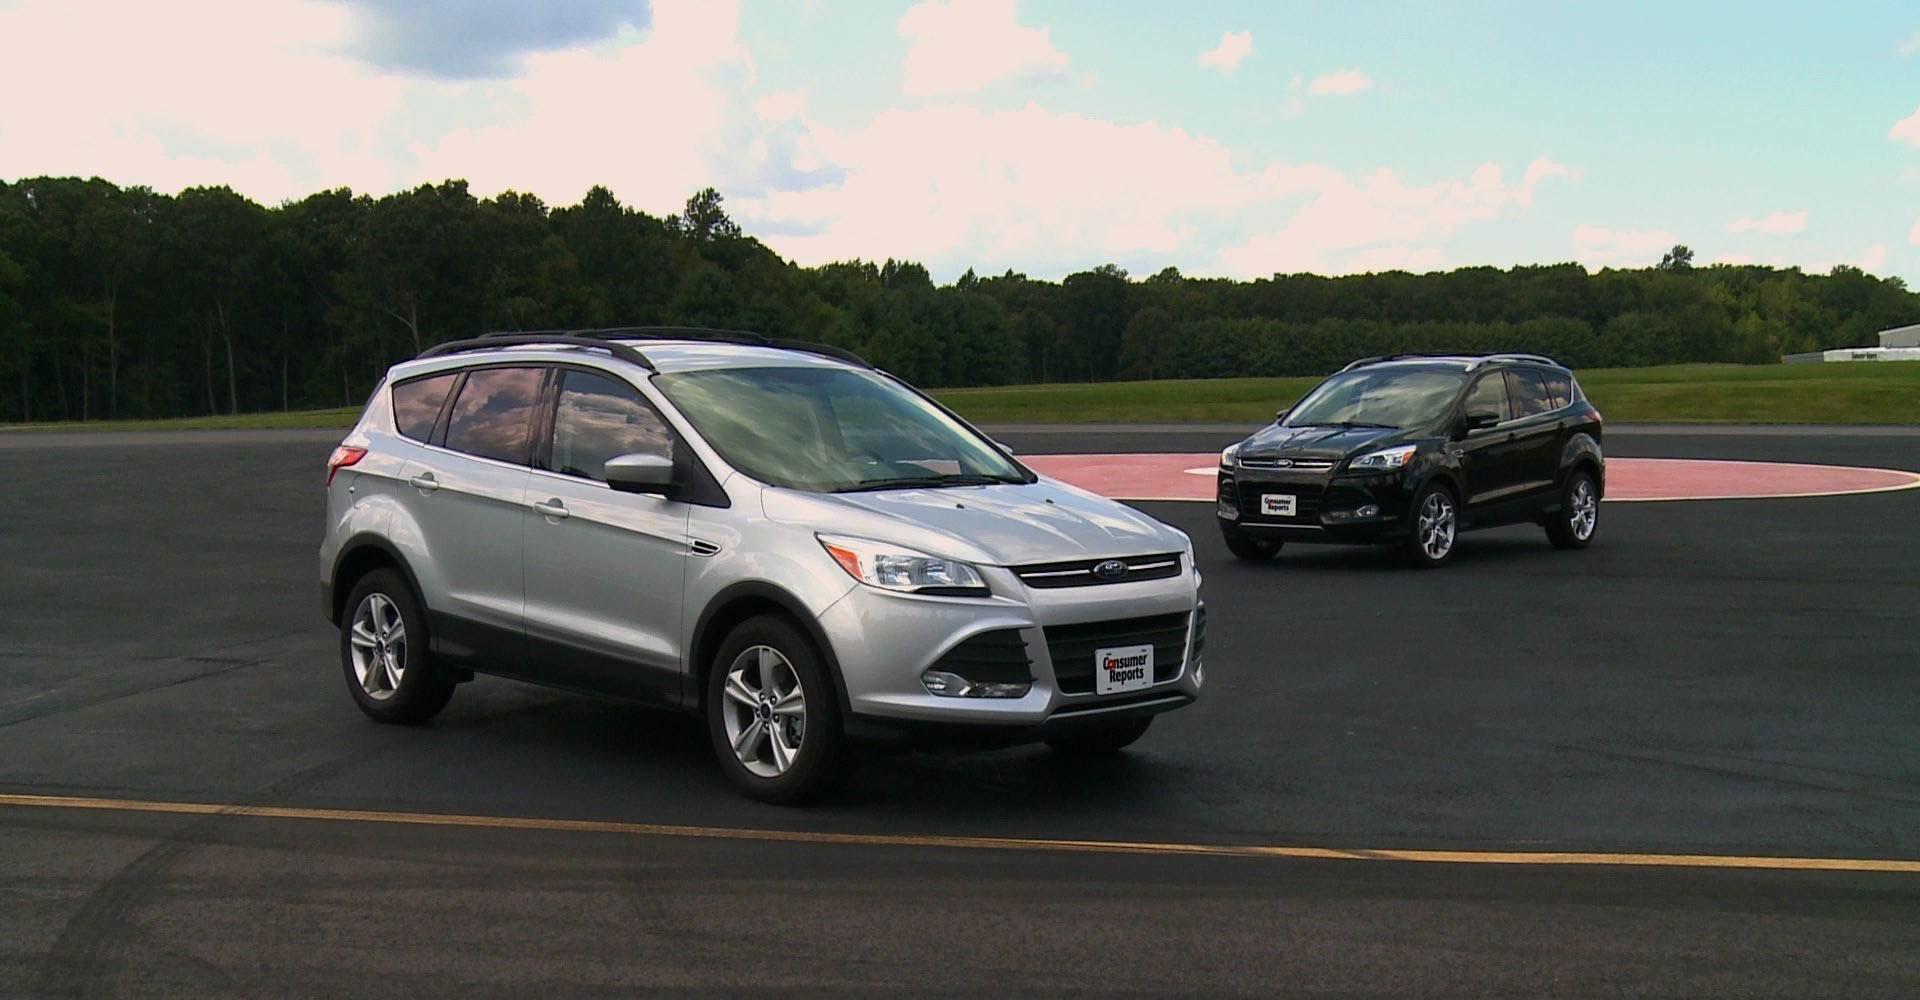 Car Dealerships Billings Mt >> Used Cars Billings Mt Used Cars Trucks Mt Wholesale